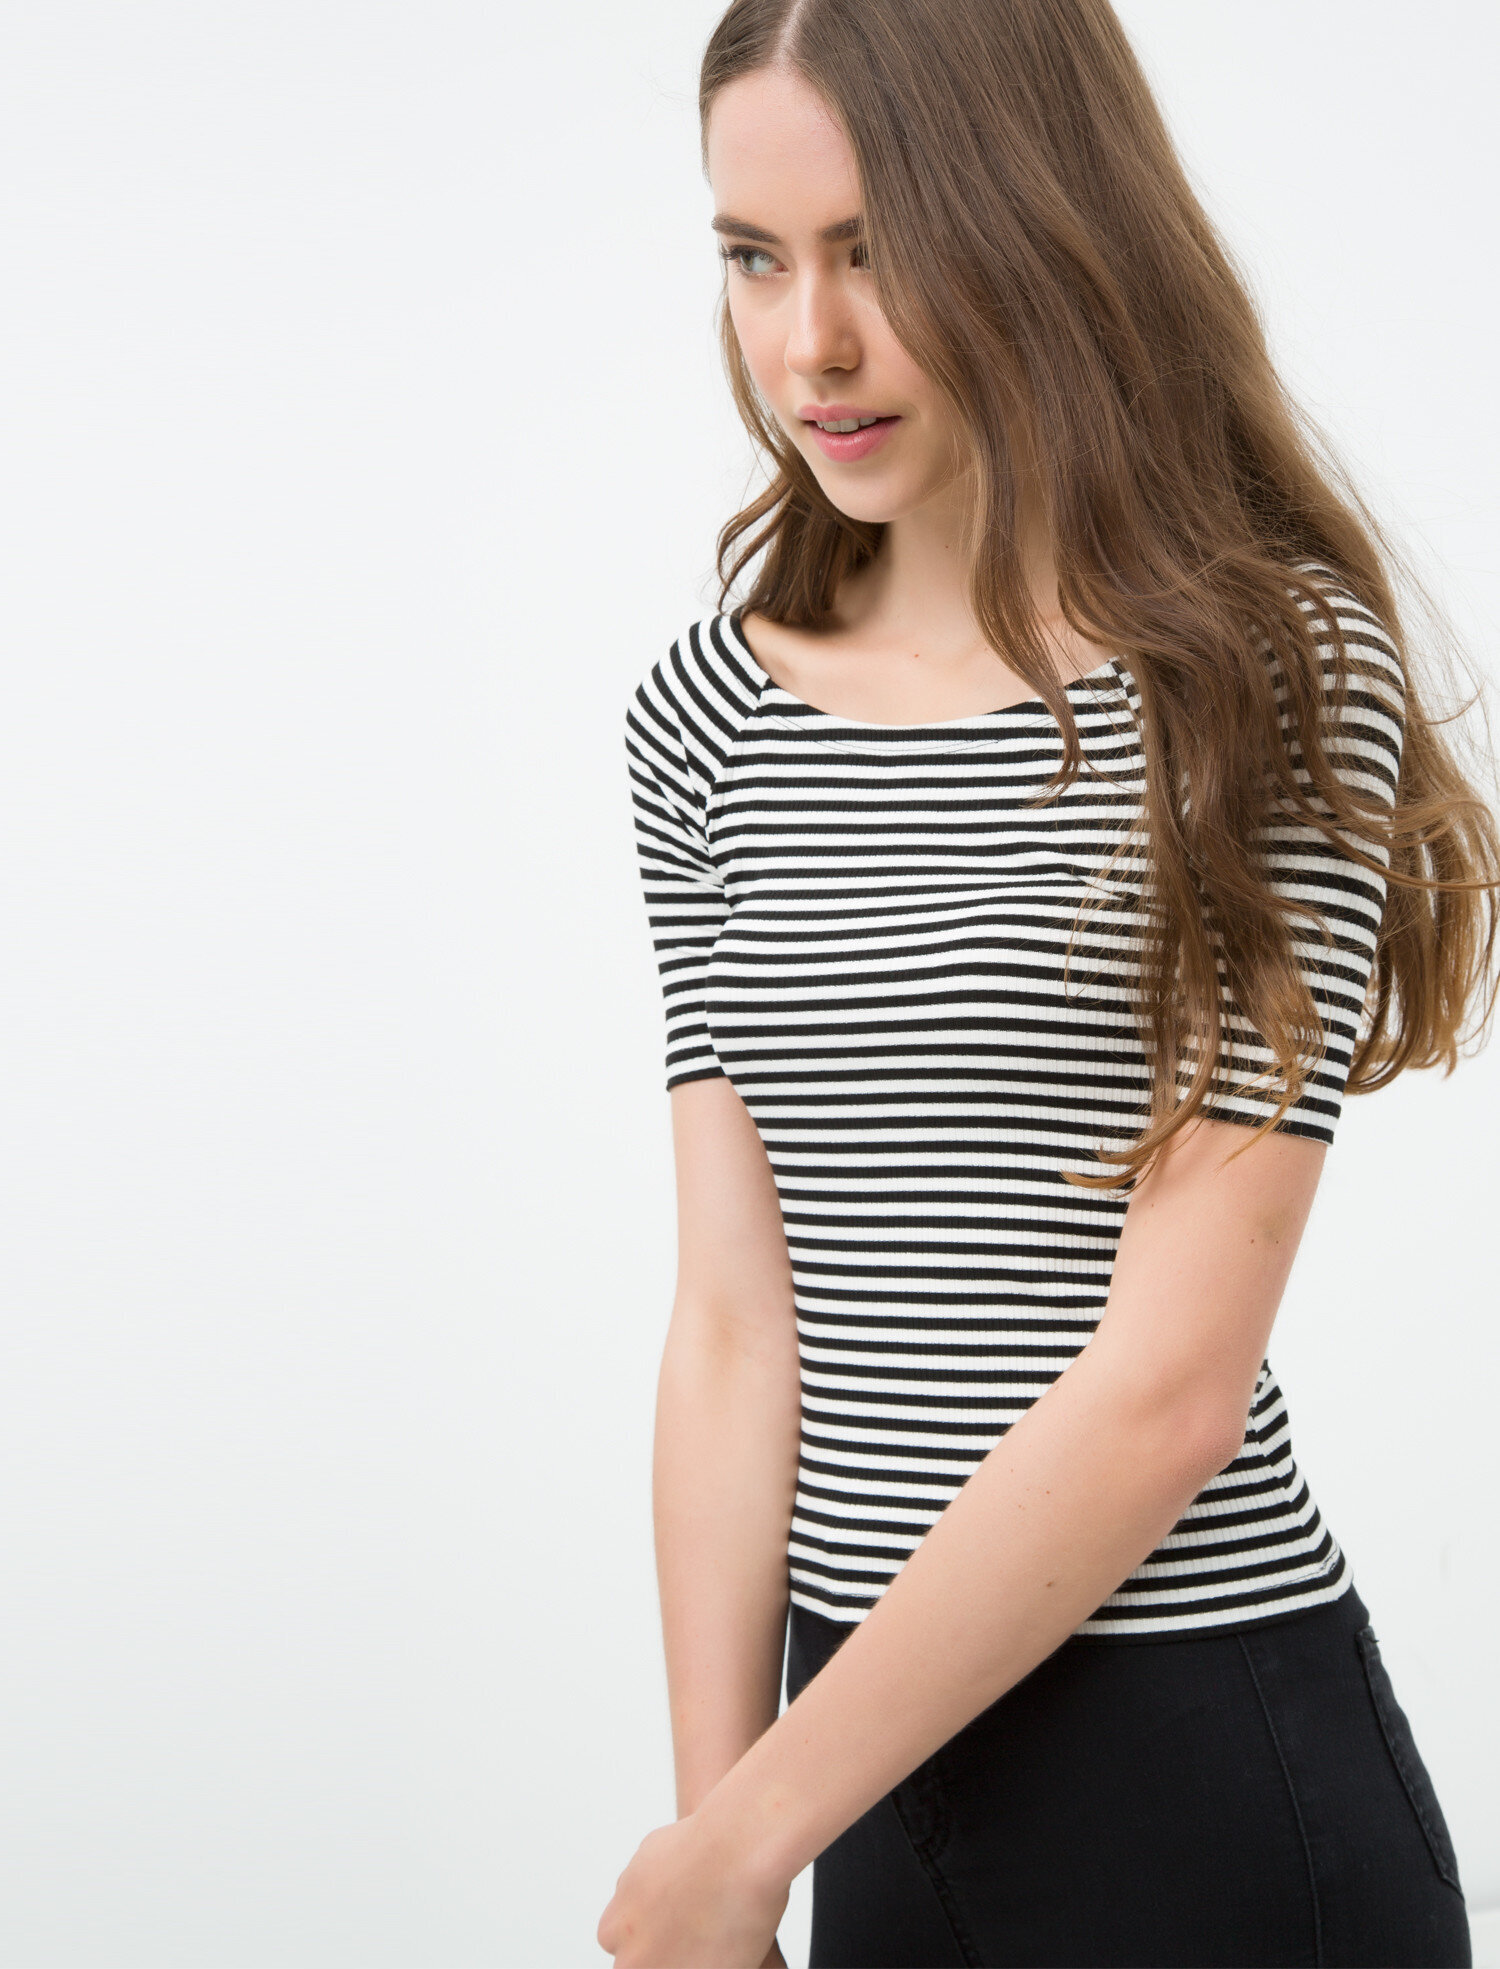 778a40cd5a26e Beyaz Çizgili Bayan Çizgili Uzun Kollu T-Shirt 6KAL11395JK24M | Koton